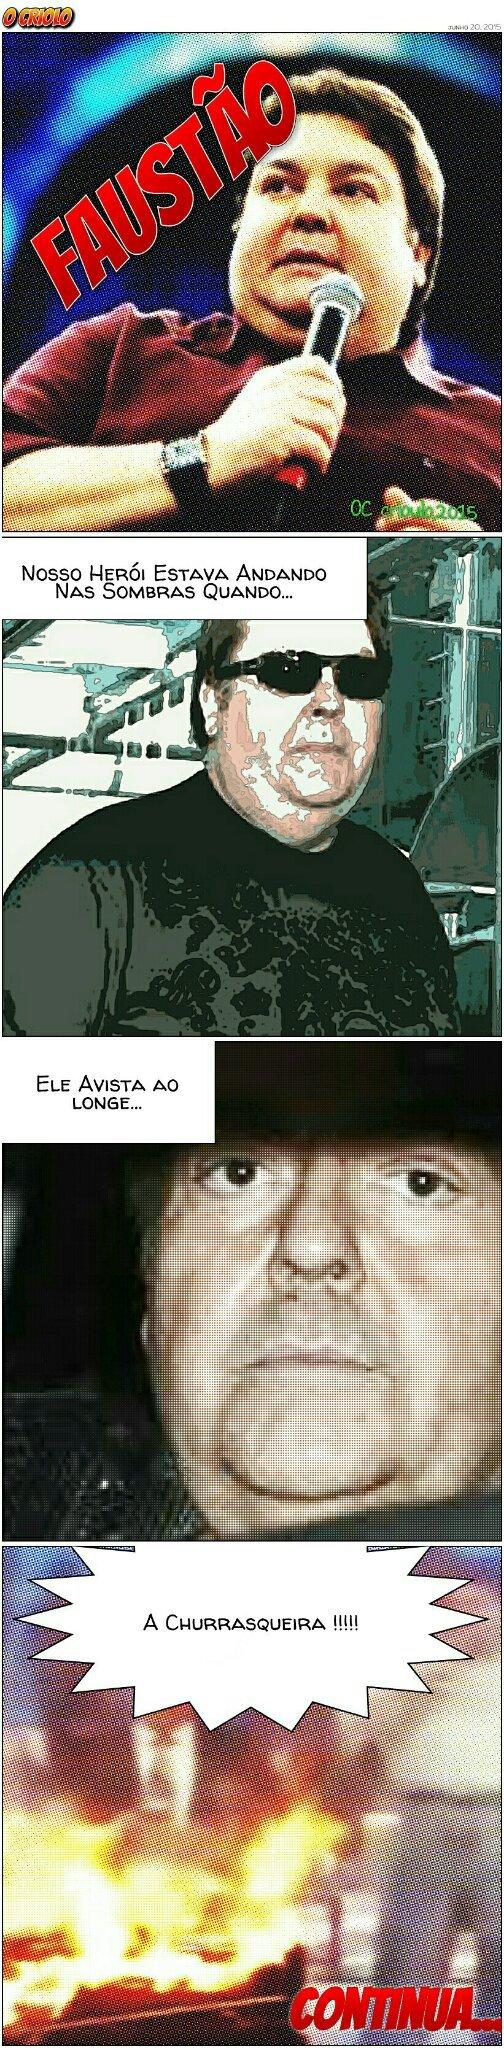 Faustao comics - meme